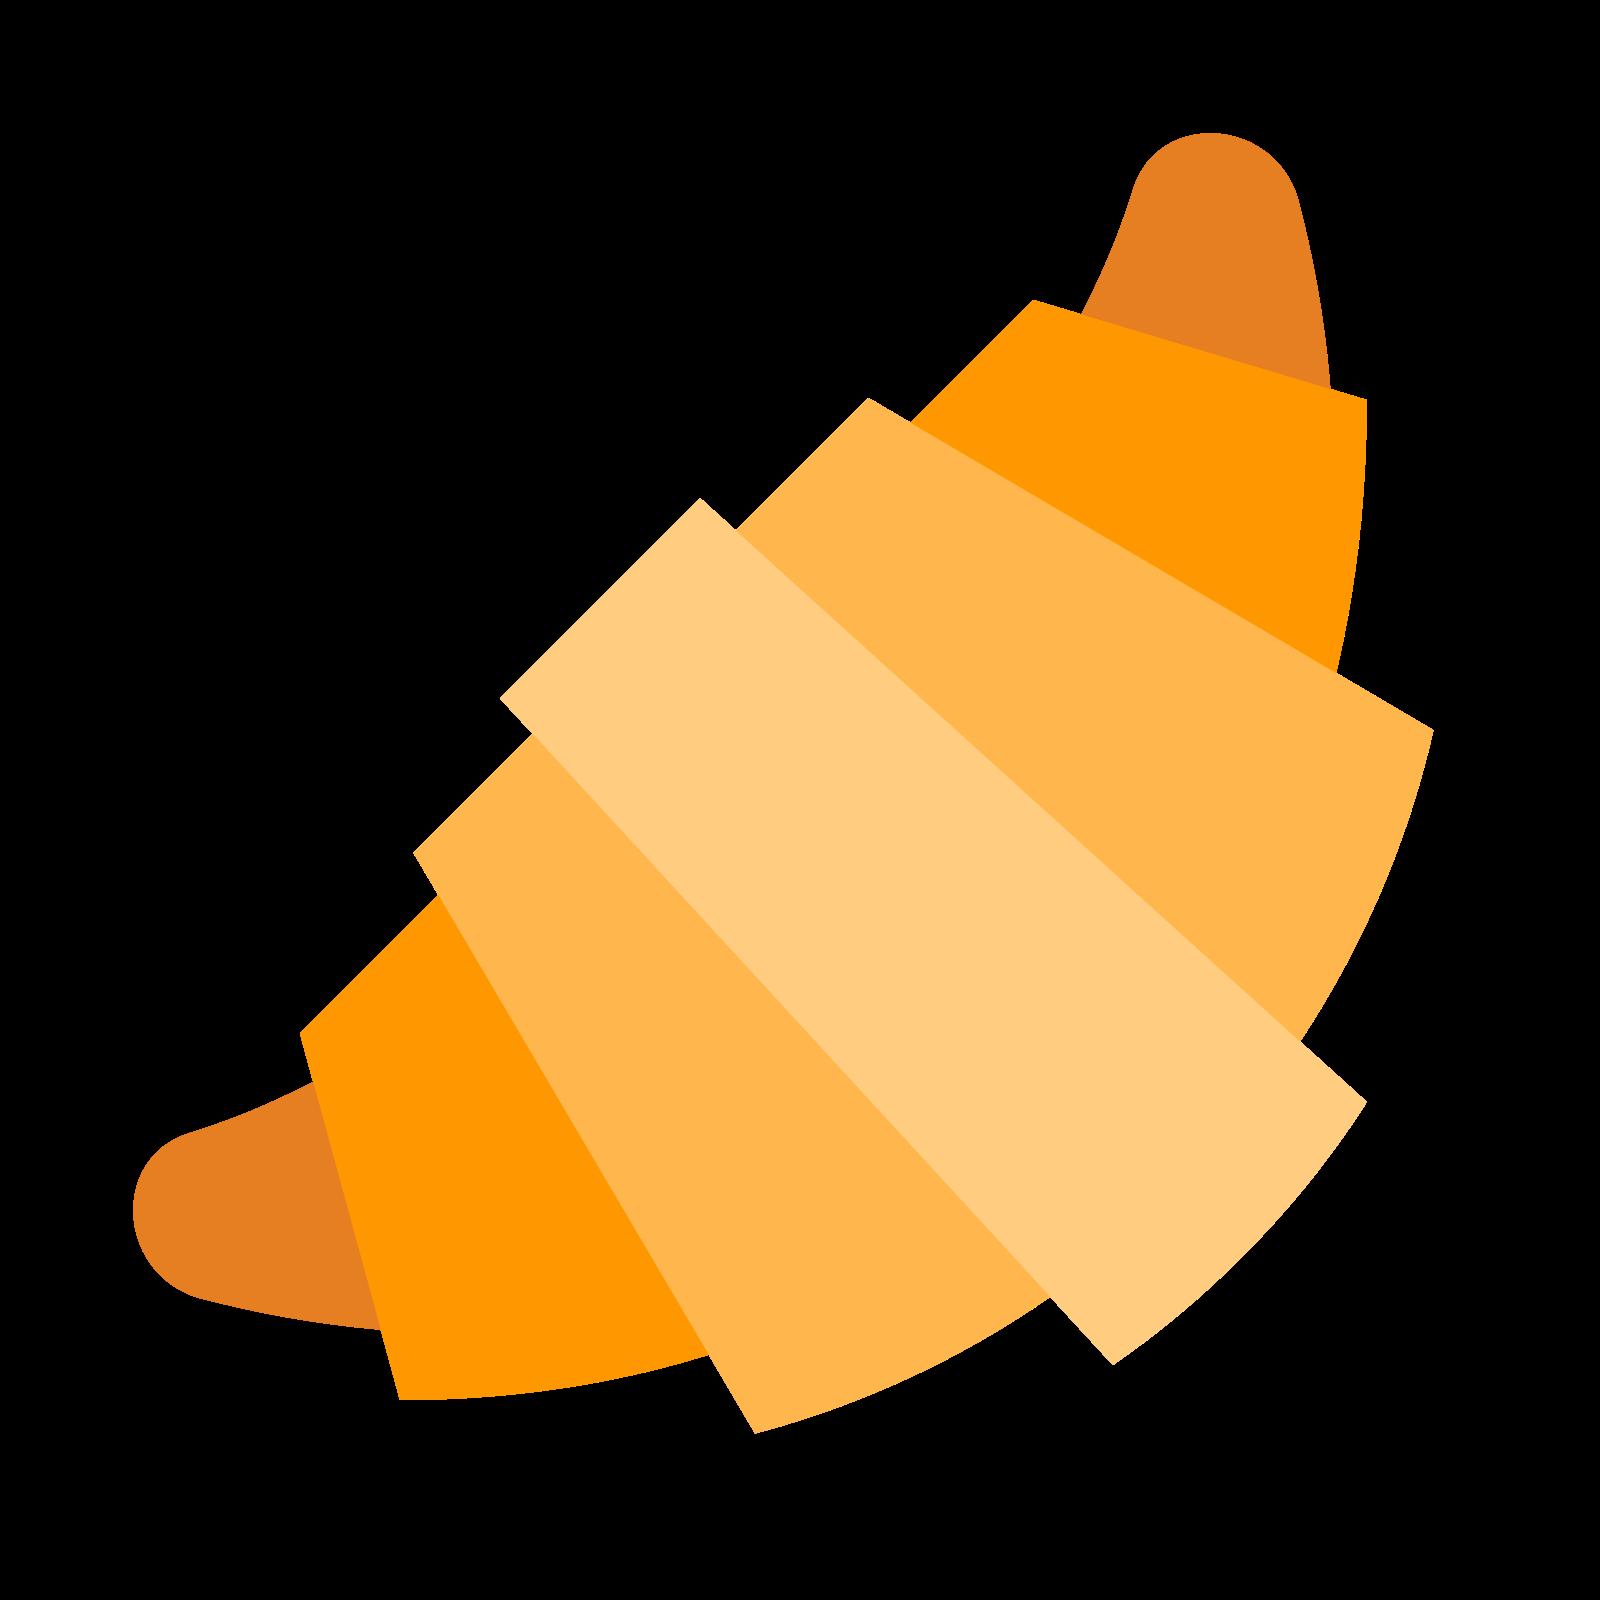 牛角面包 icon